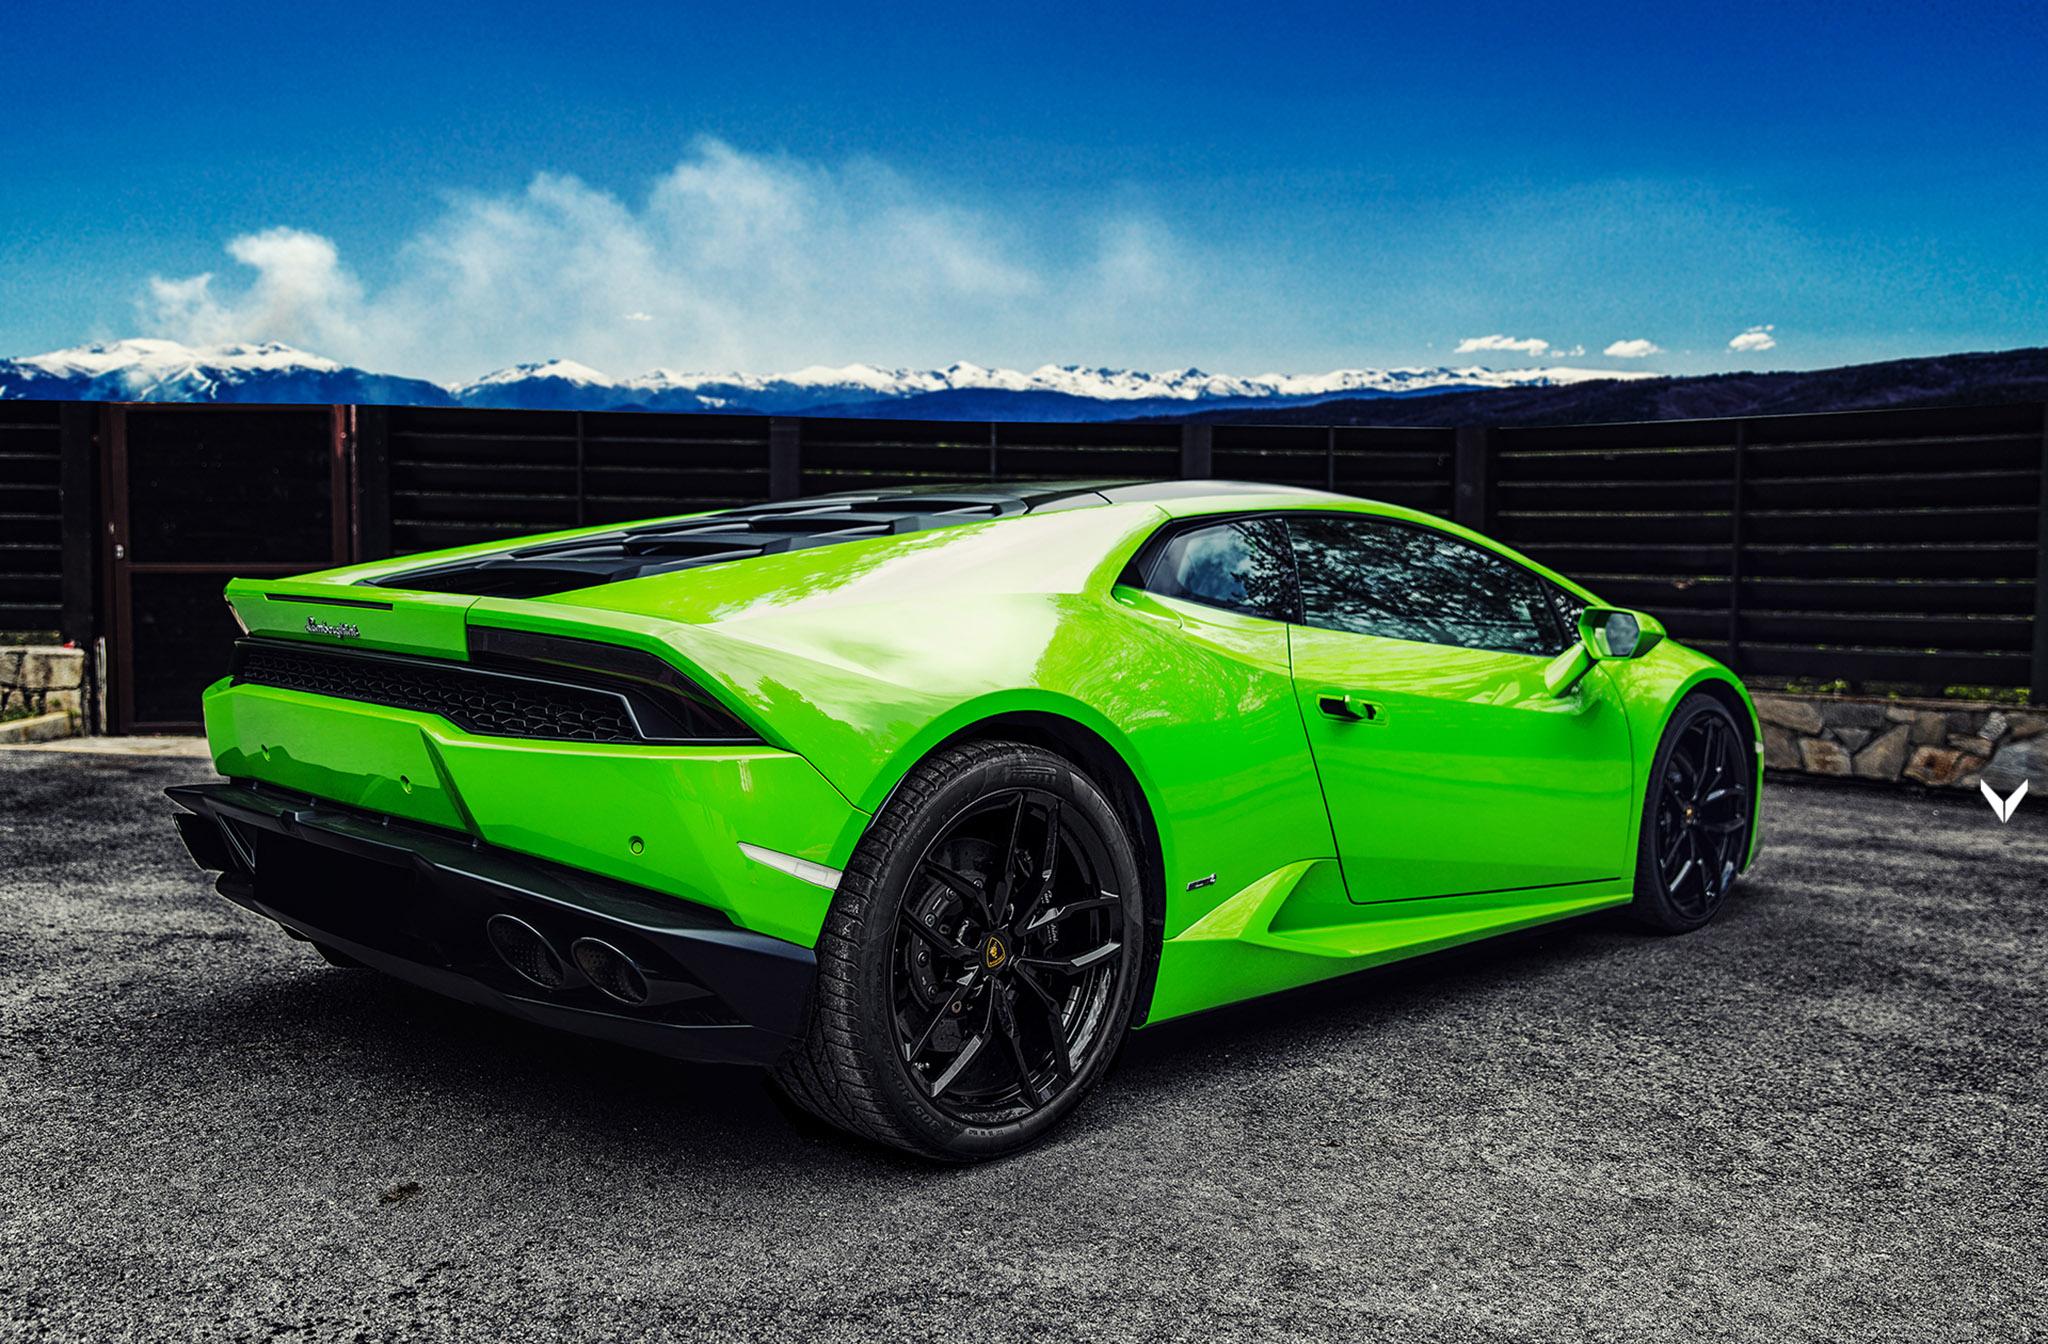 Vilner S Verde Mantis Lamborghini Huracan Should Brighten Your Day